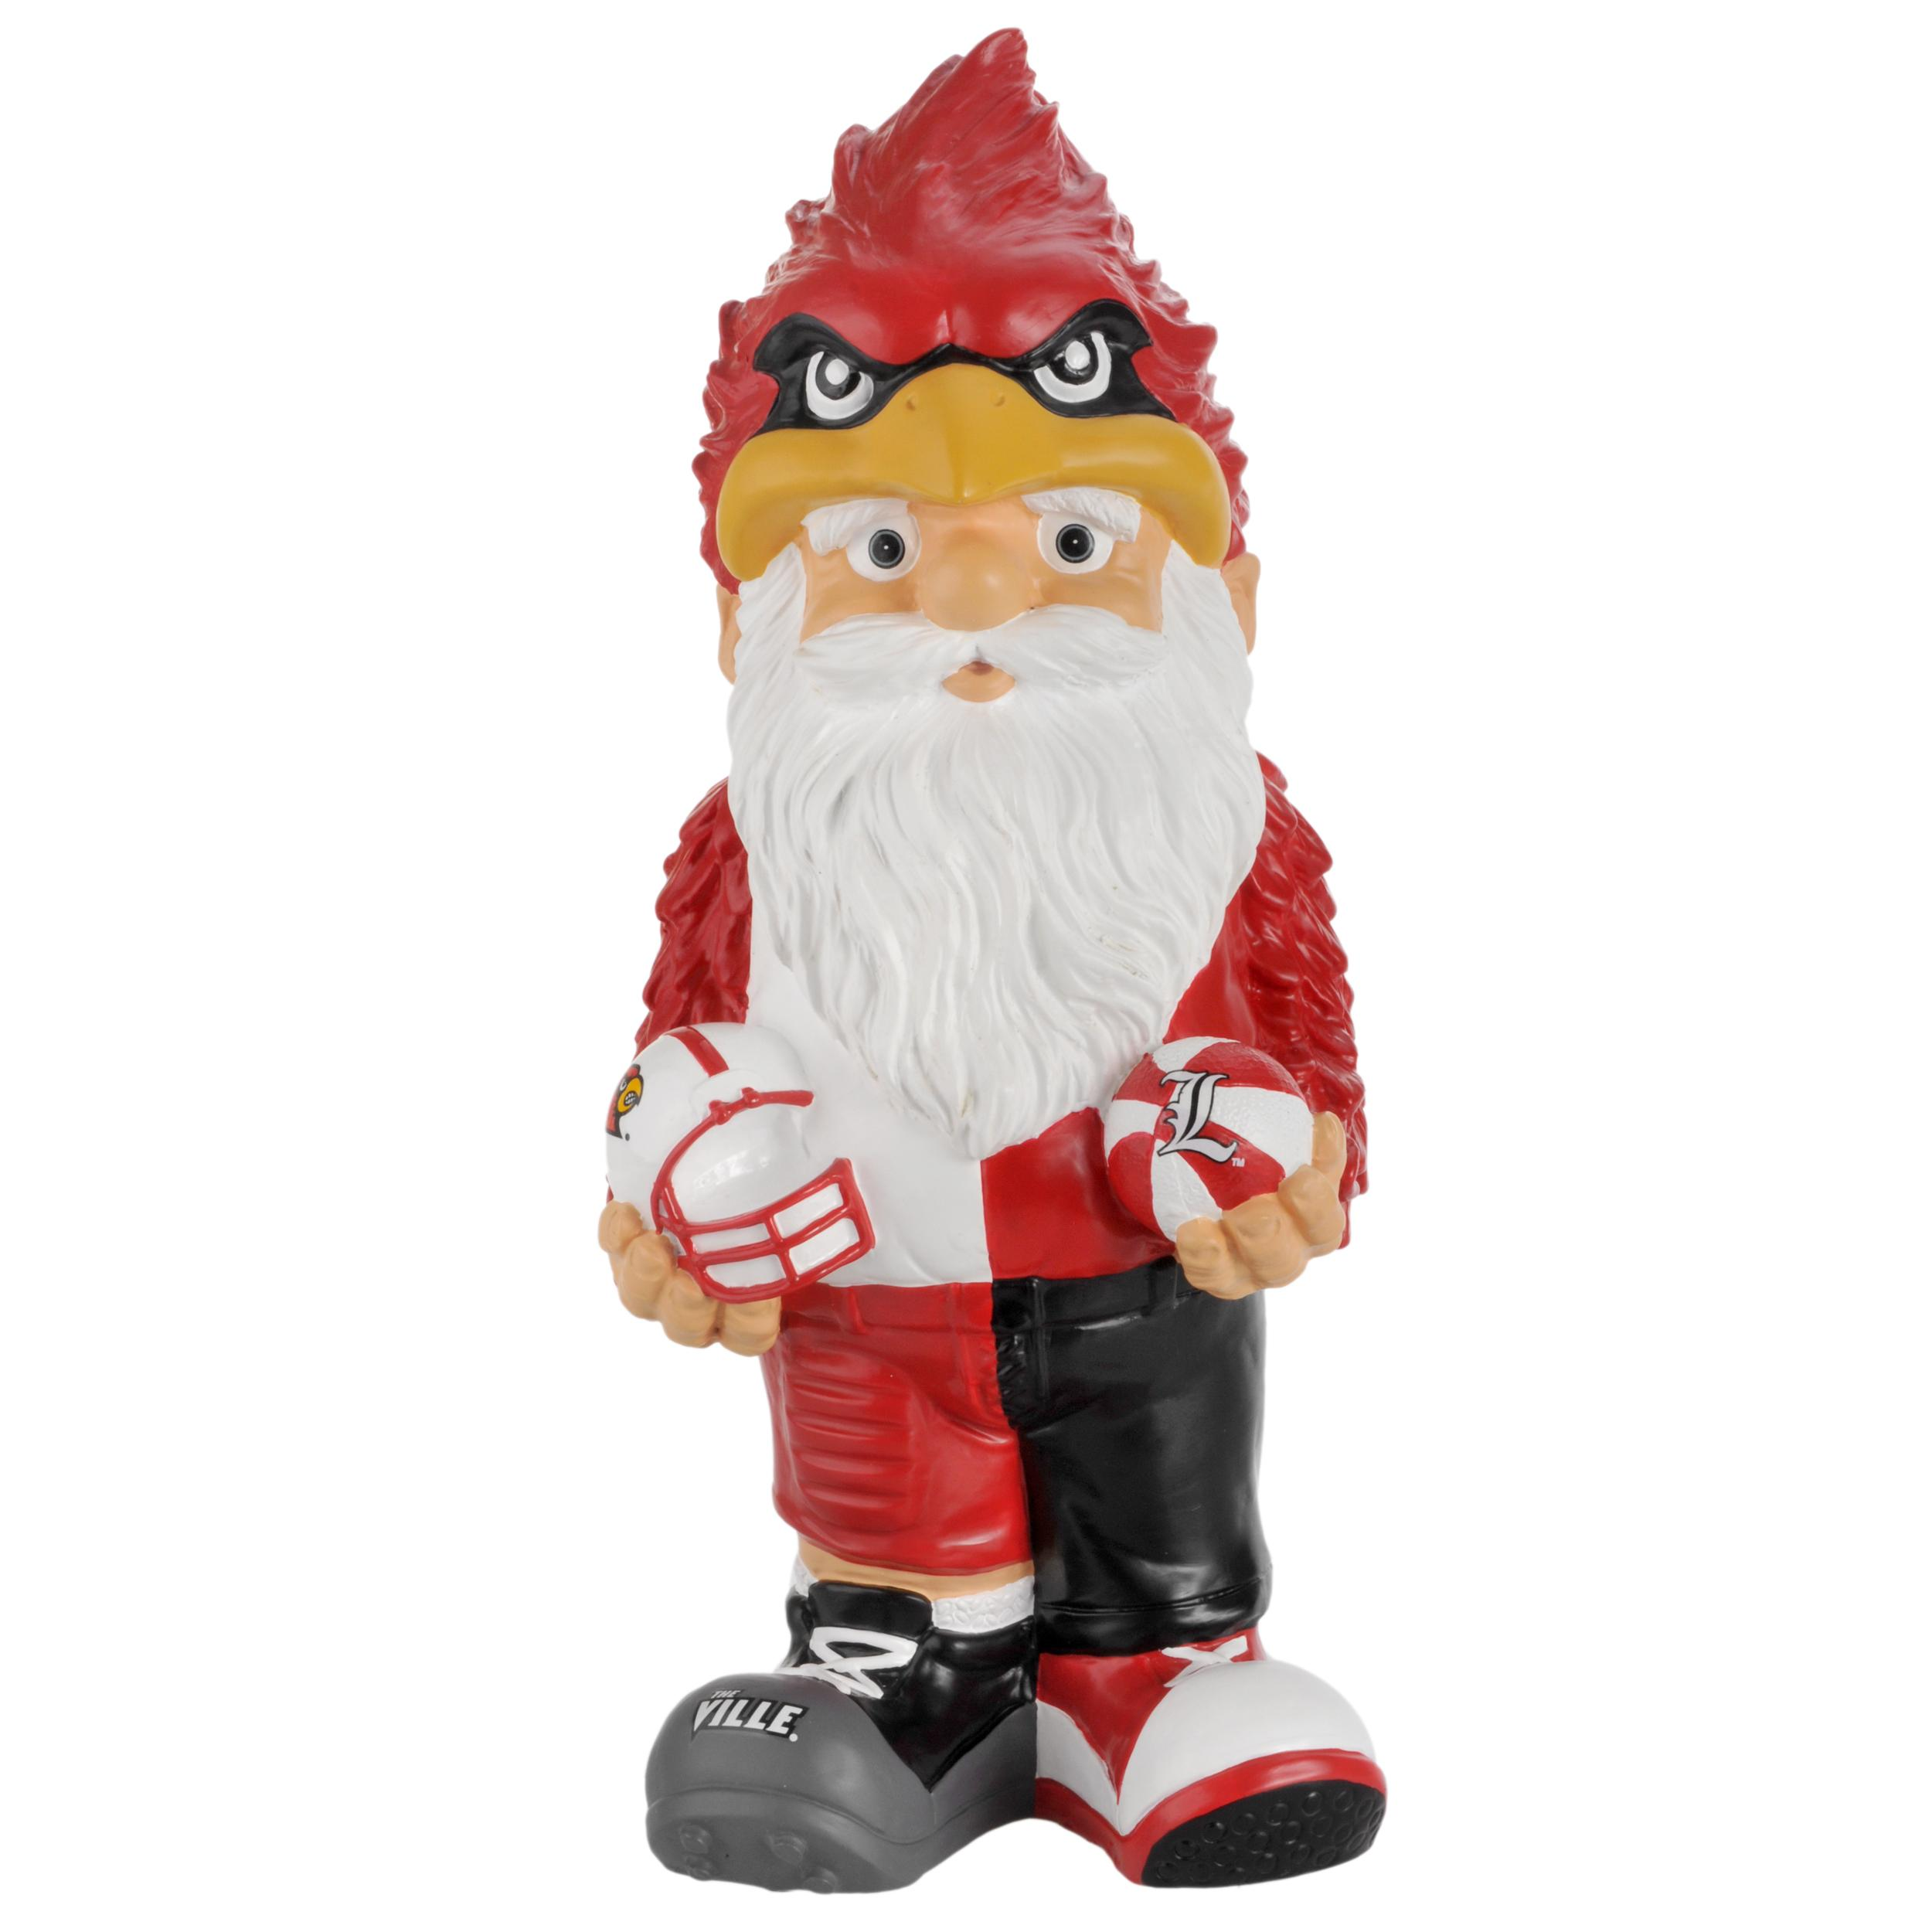 Louisville Cardinals 11-inch Thematic Garden Gnome